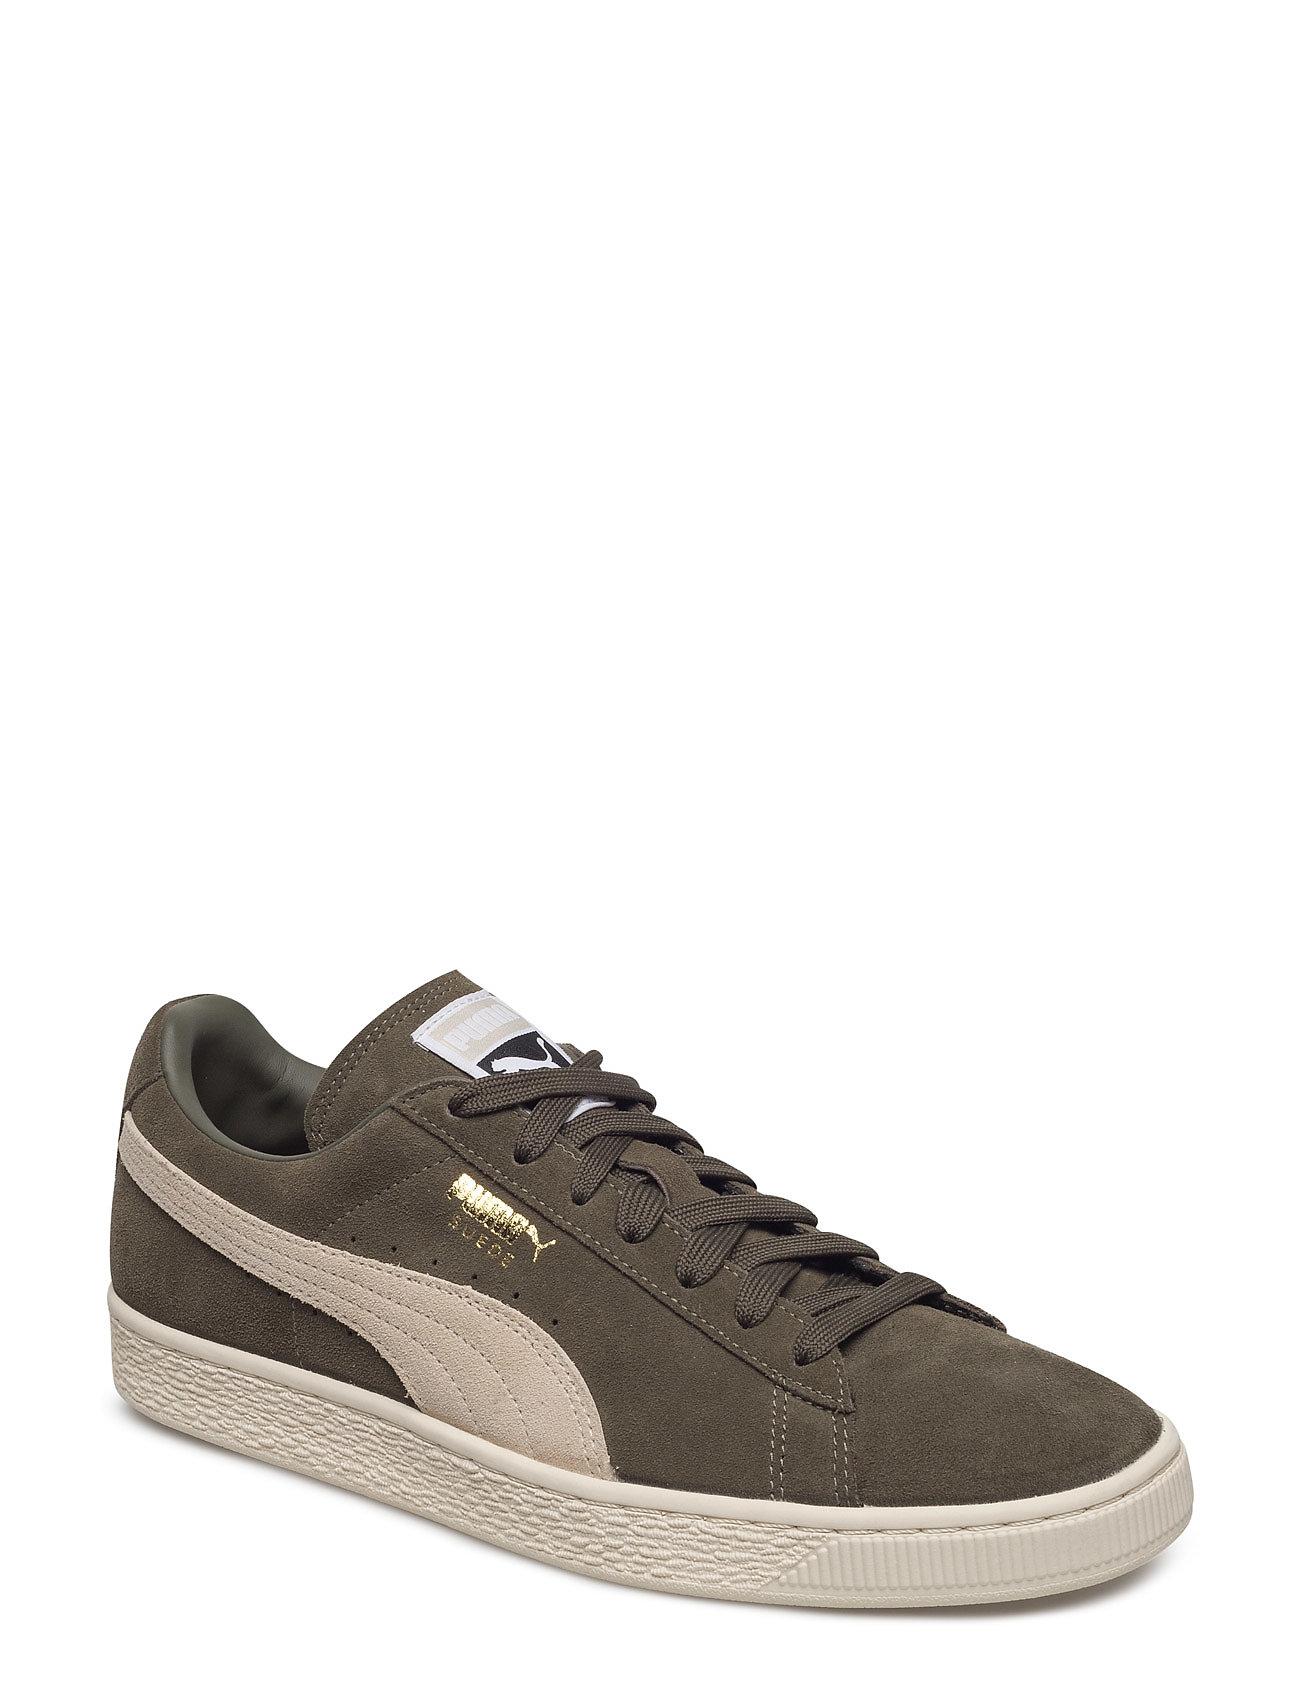 Suede Classic + Puma Sneakers til Herrer i